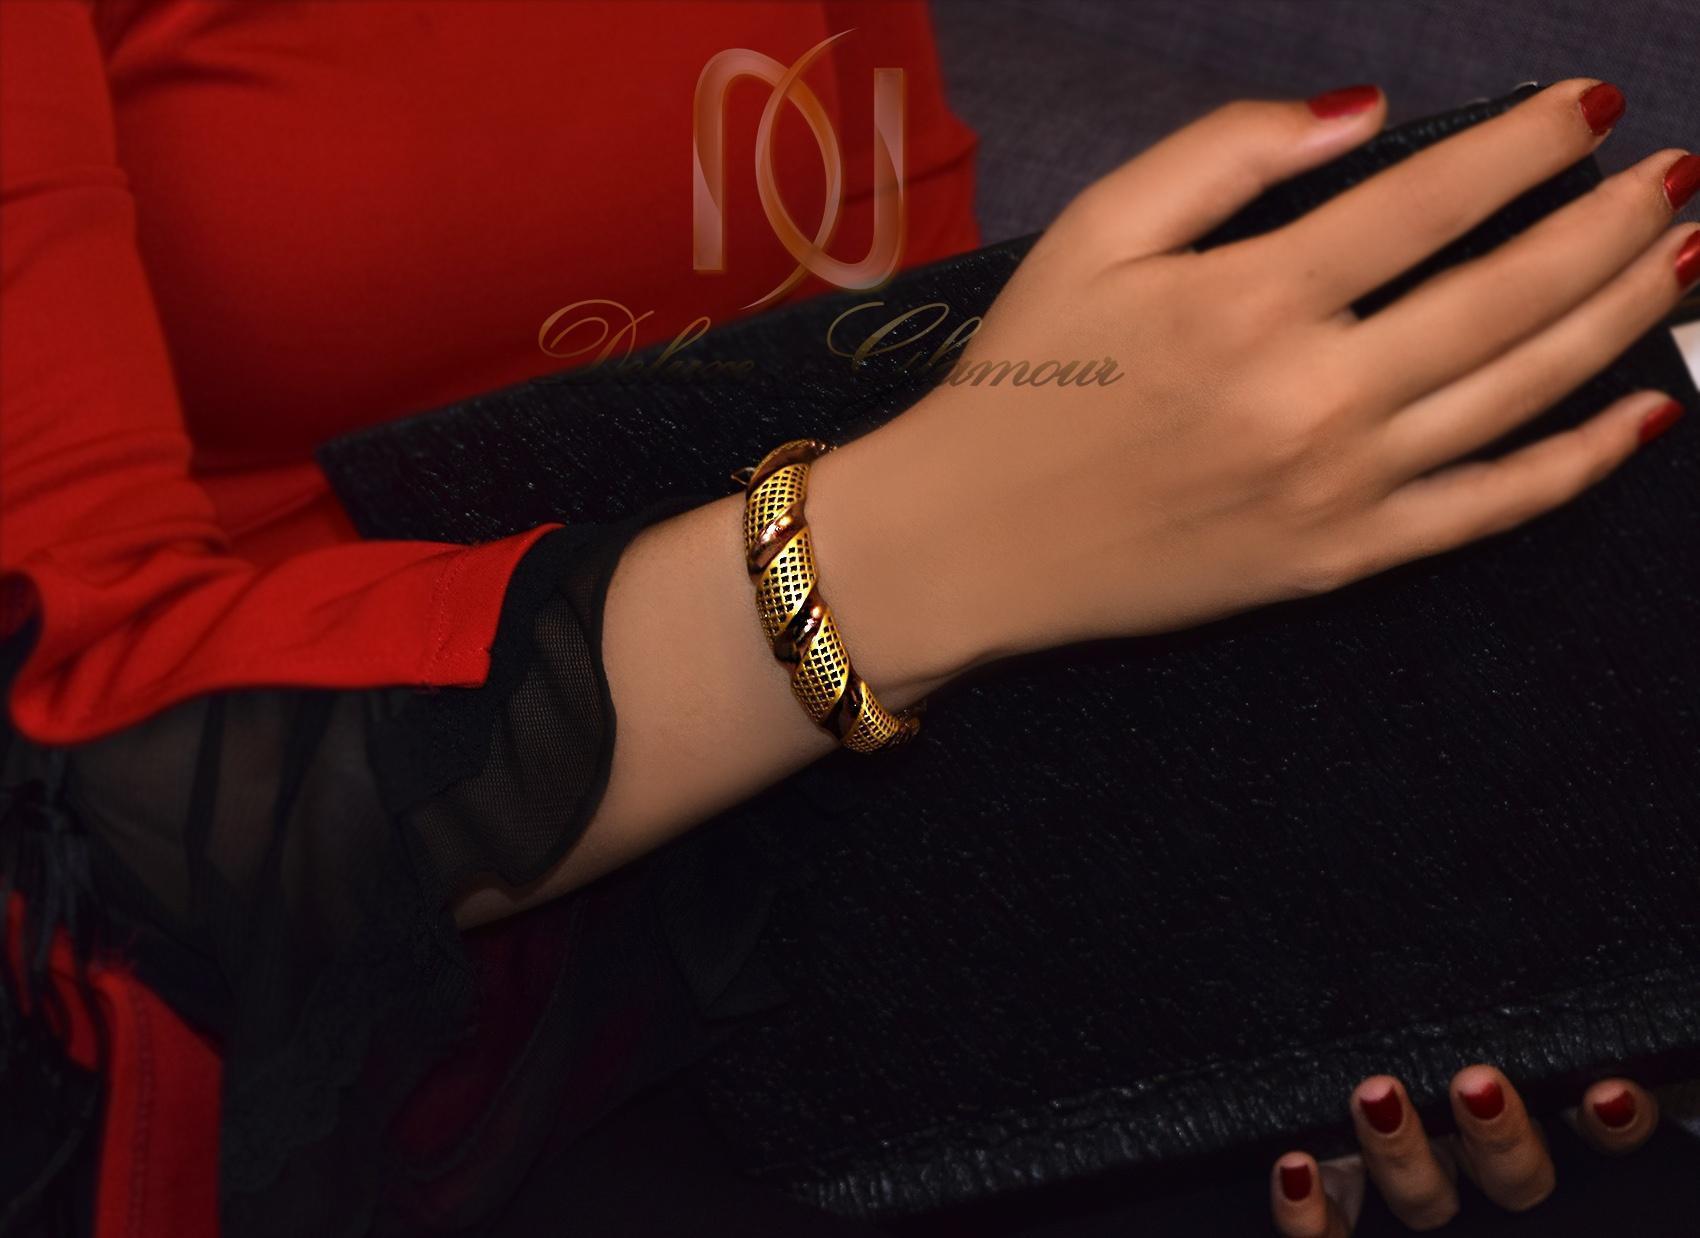 دستبند نقره زنانه دو رنگ طرح پرستیژ ds-n291